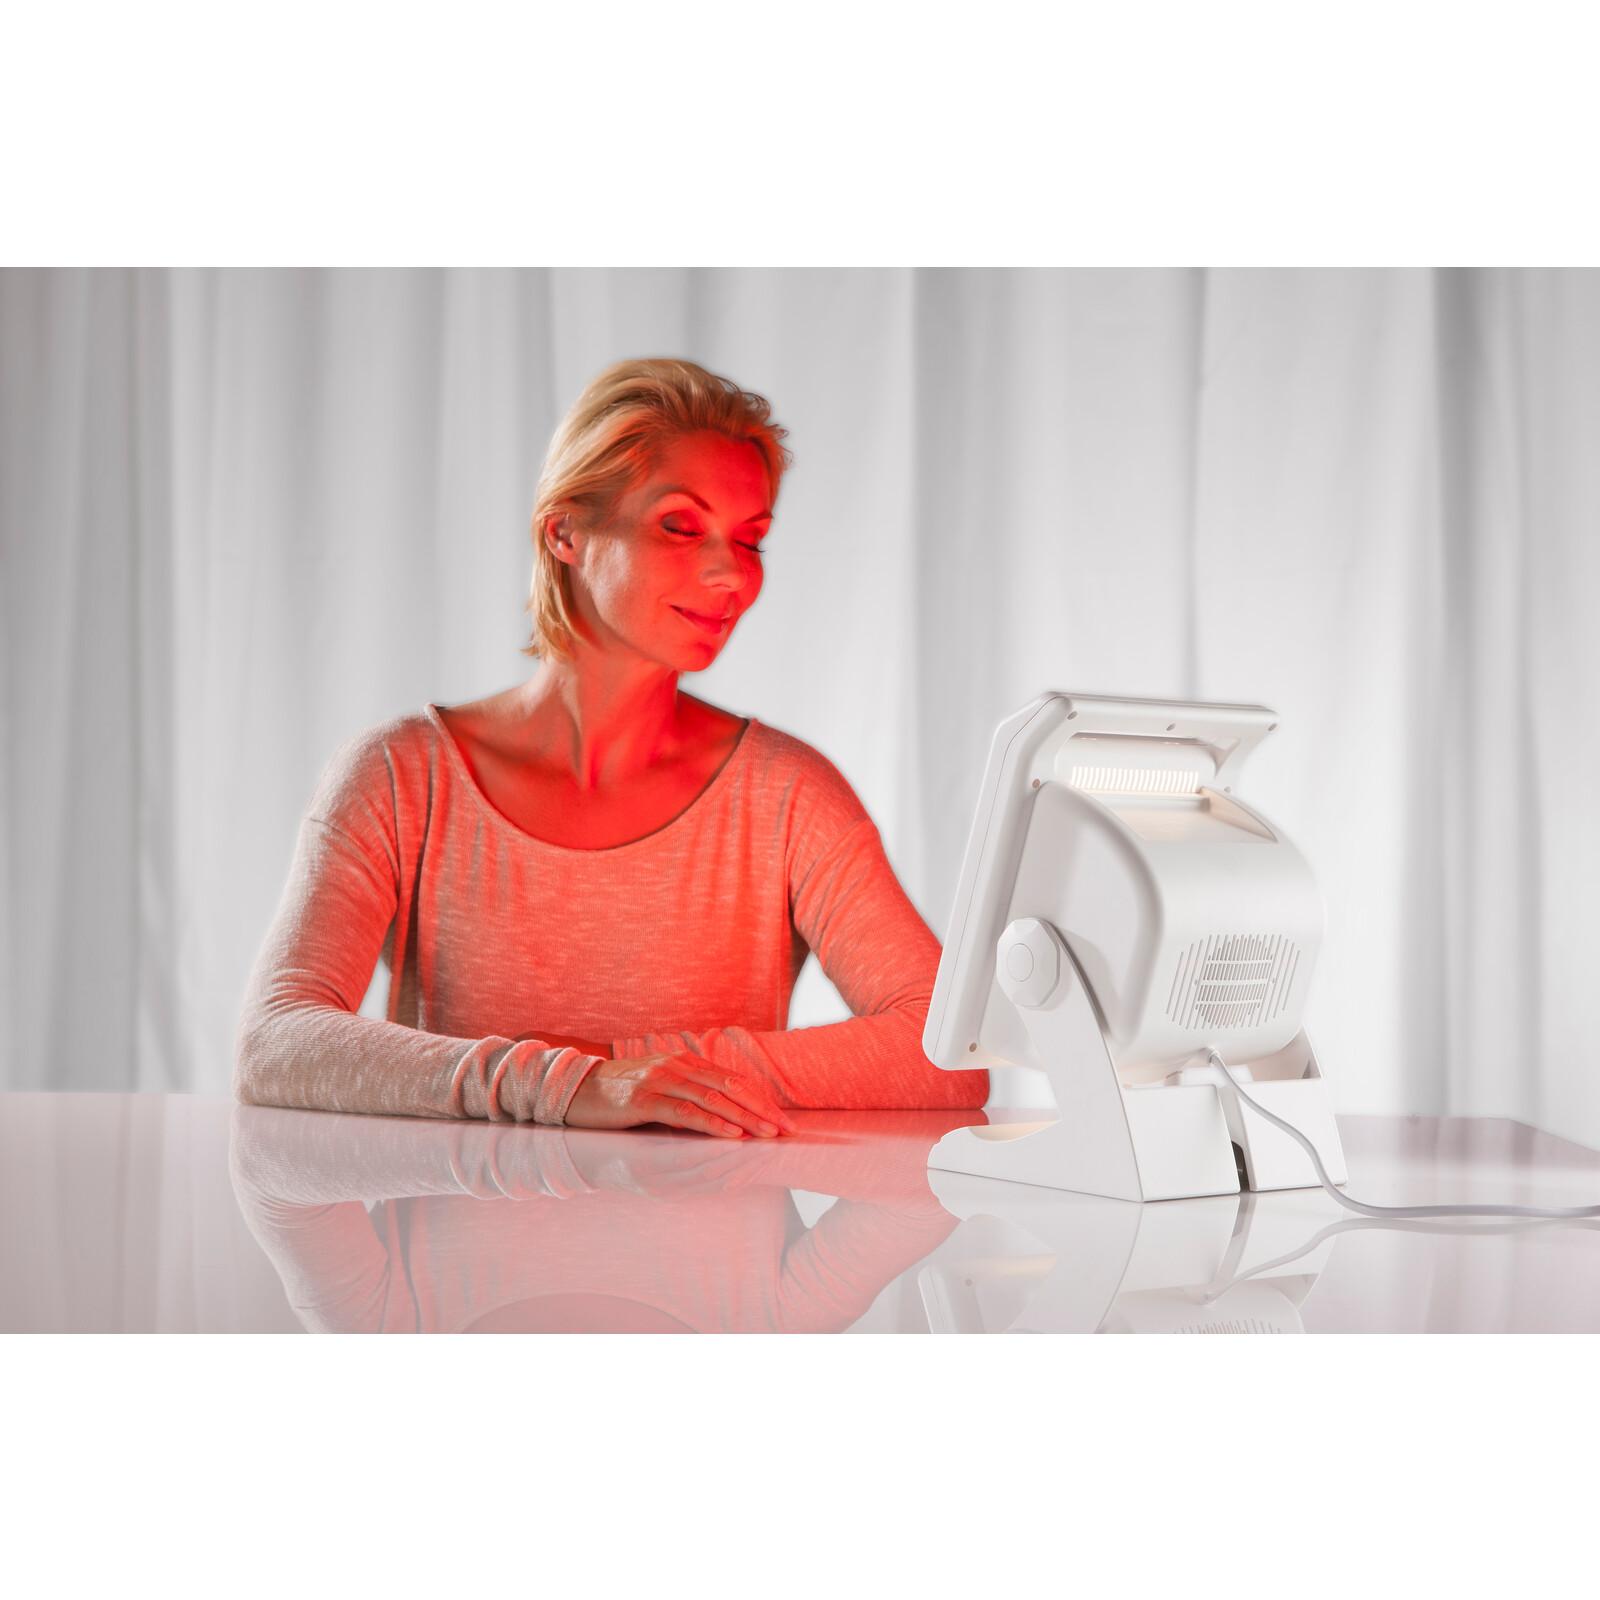 Medisana IR 885 Infrarot Lampe